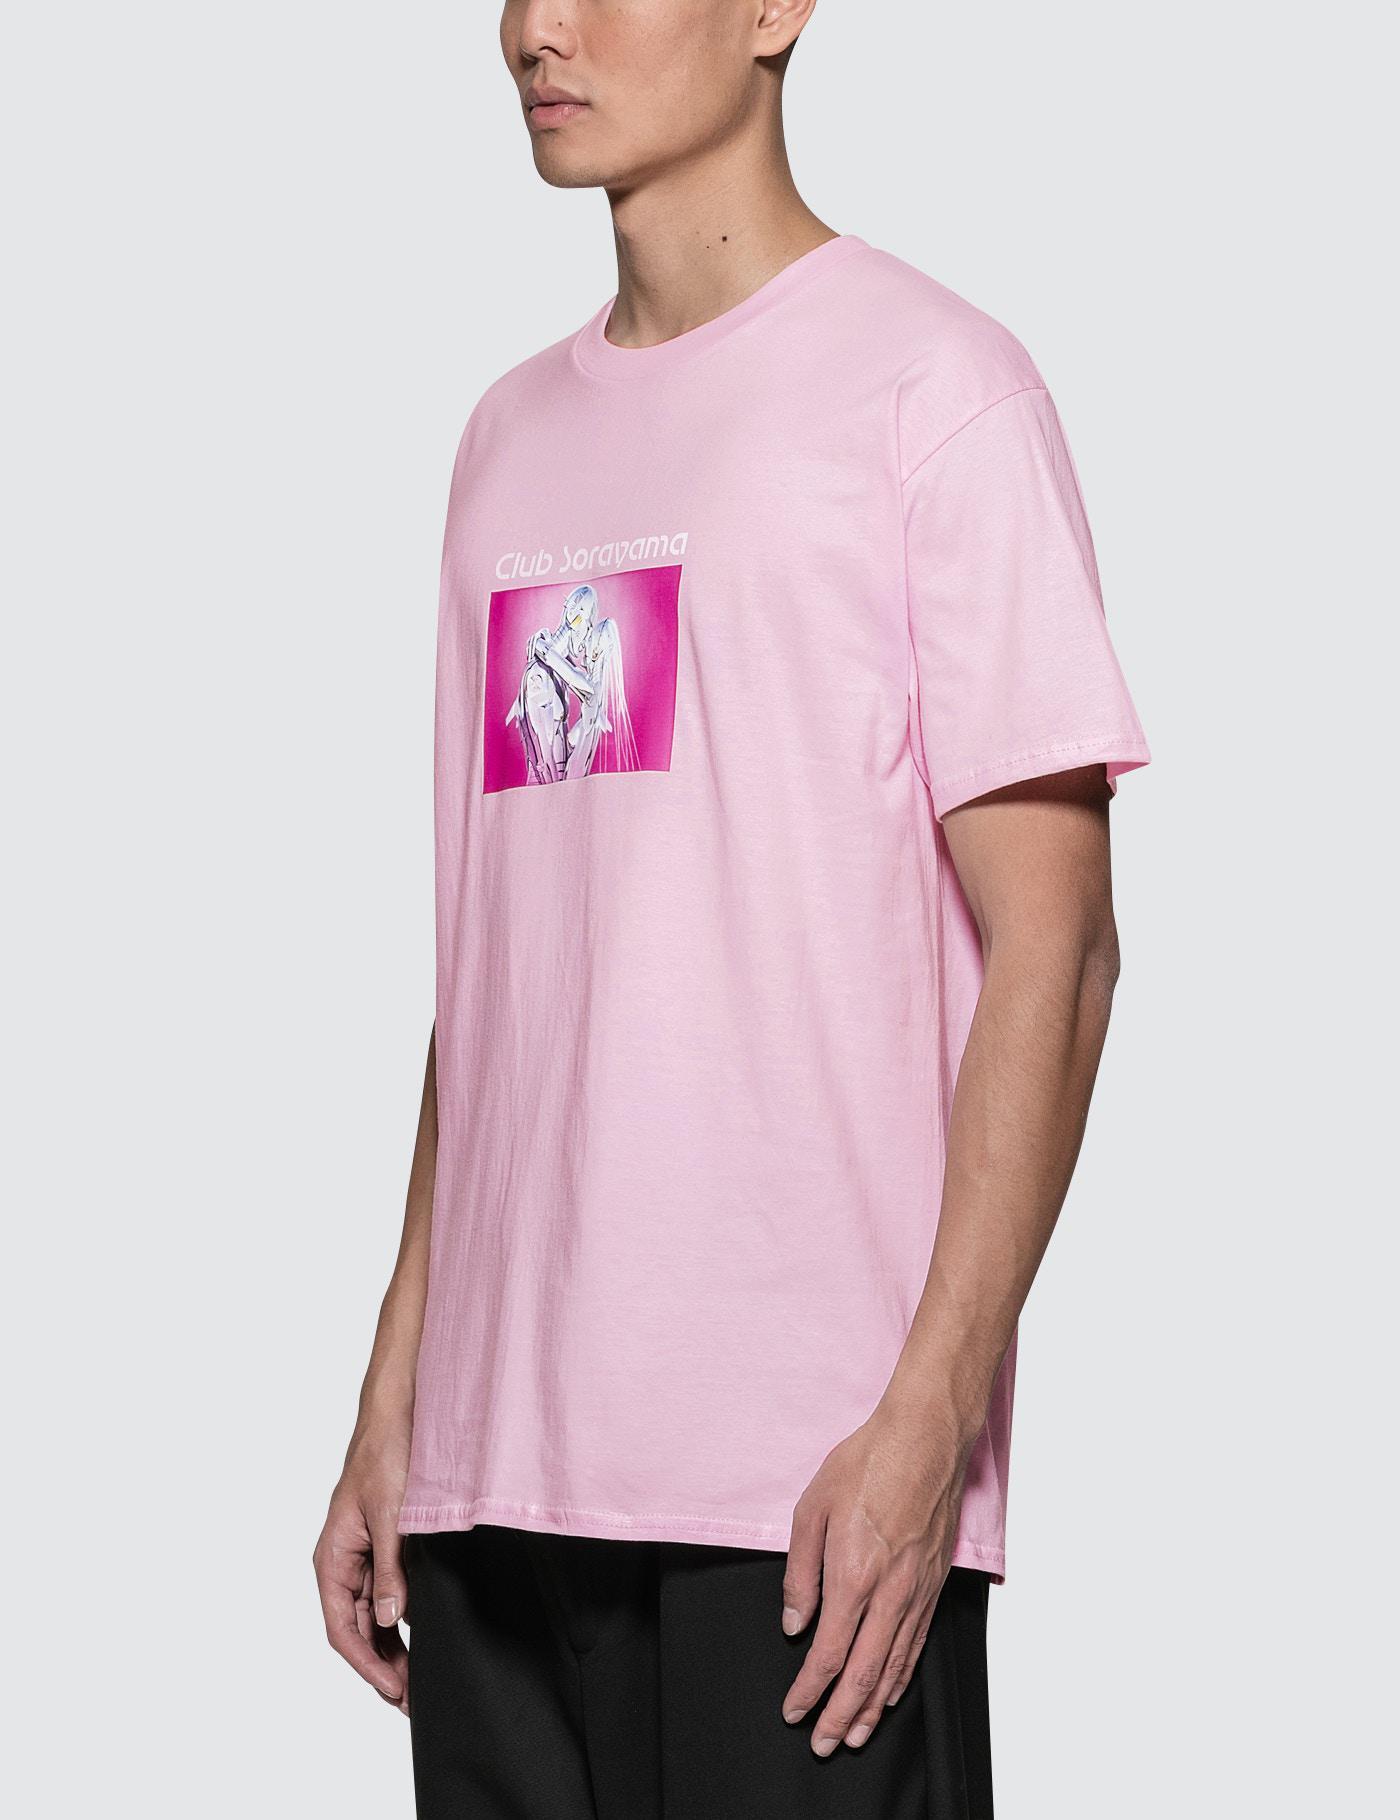 4cc8e649 Lyst - Club Sorayama T-shirt 4 in Pink for Men